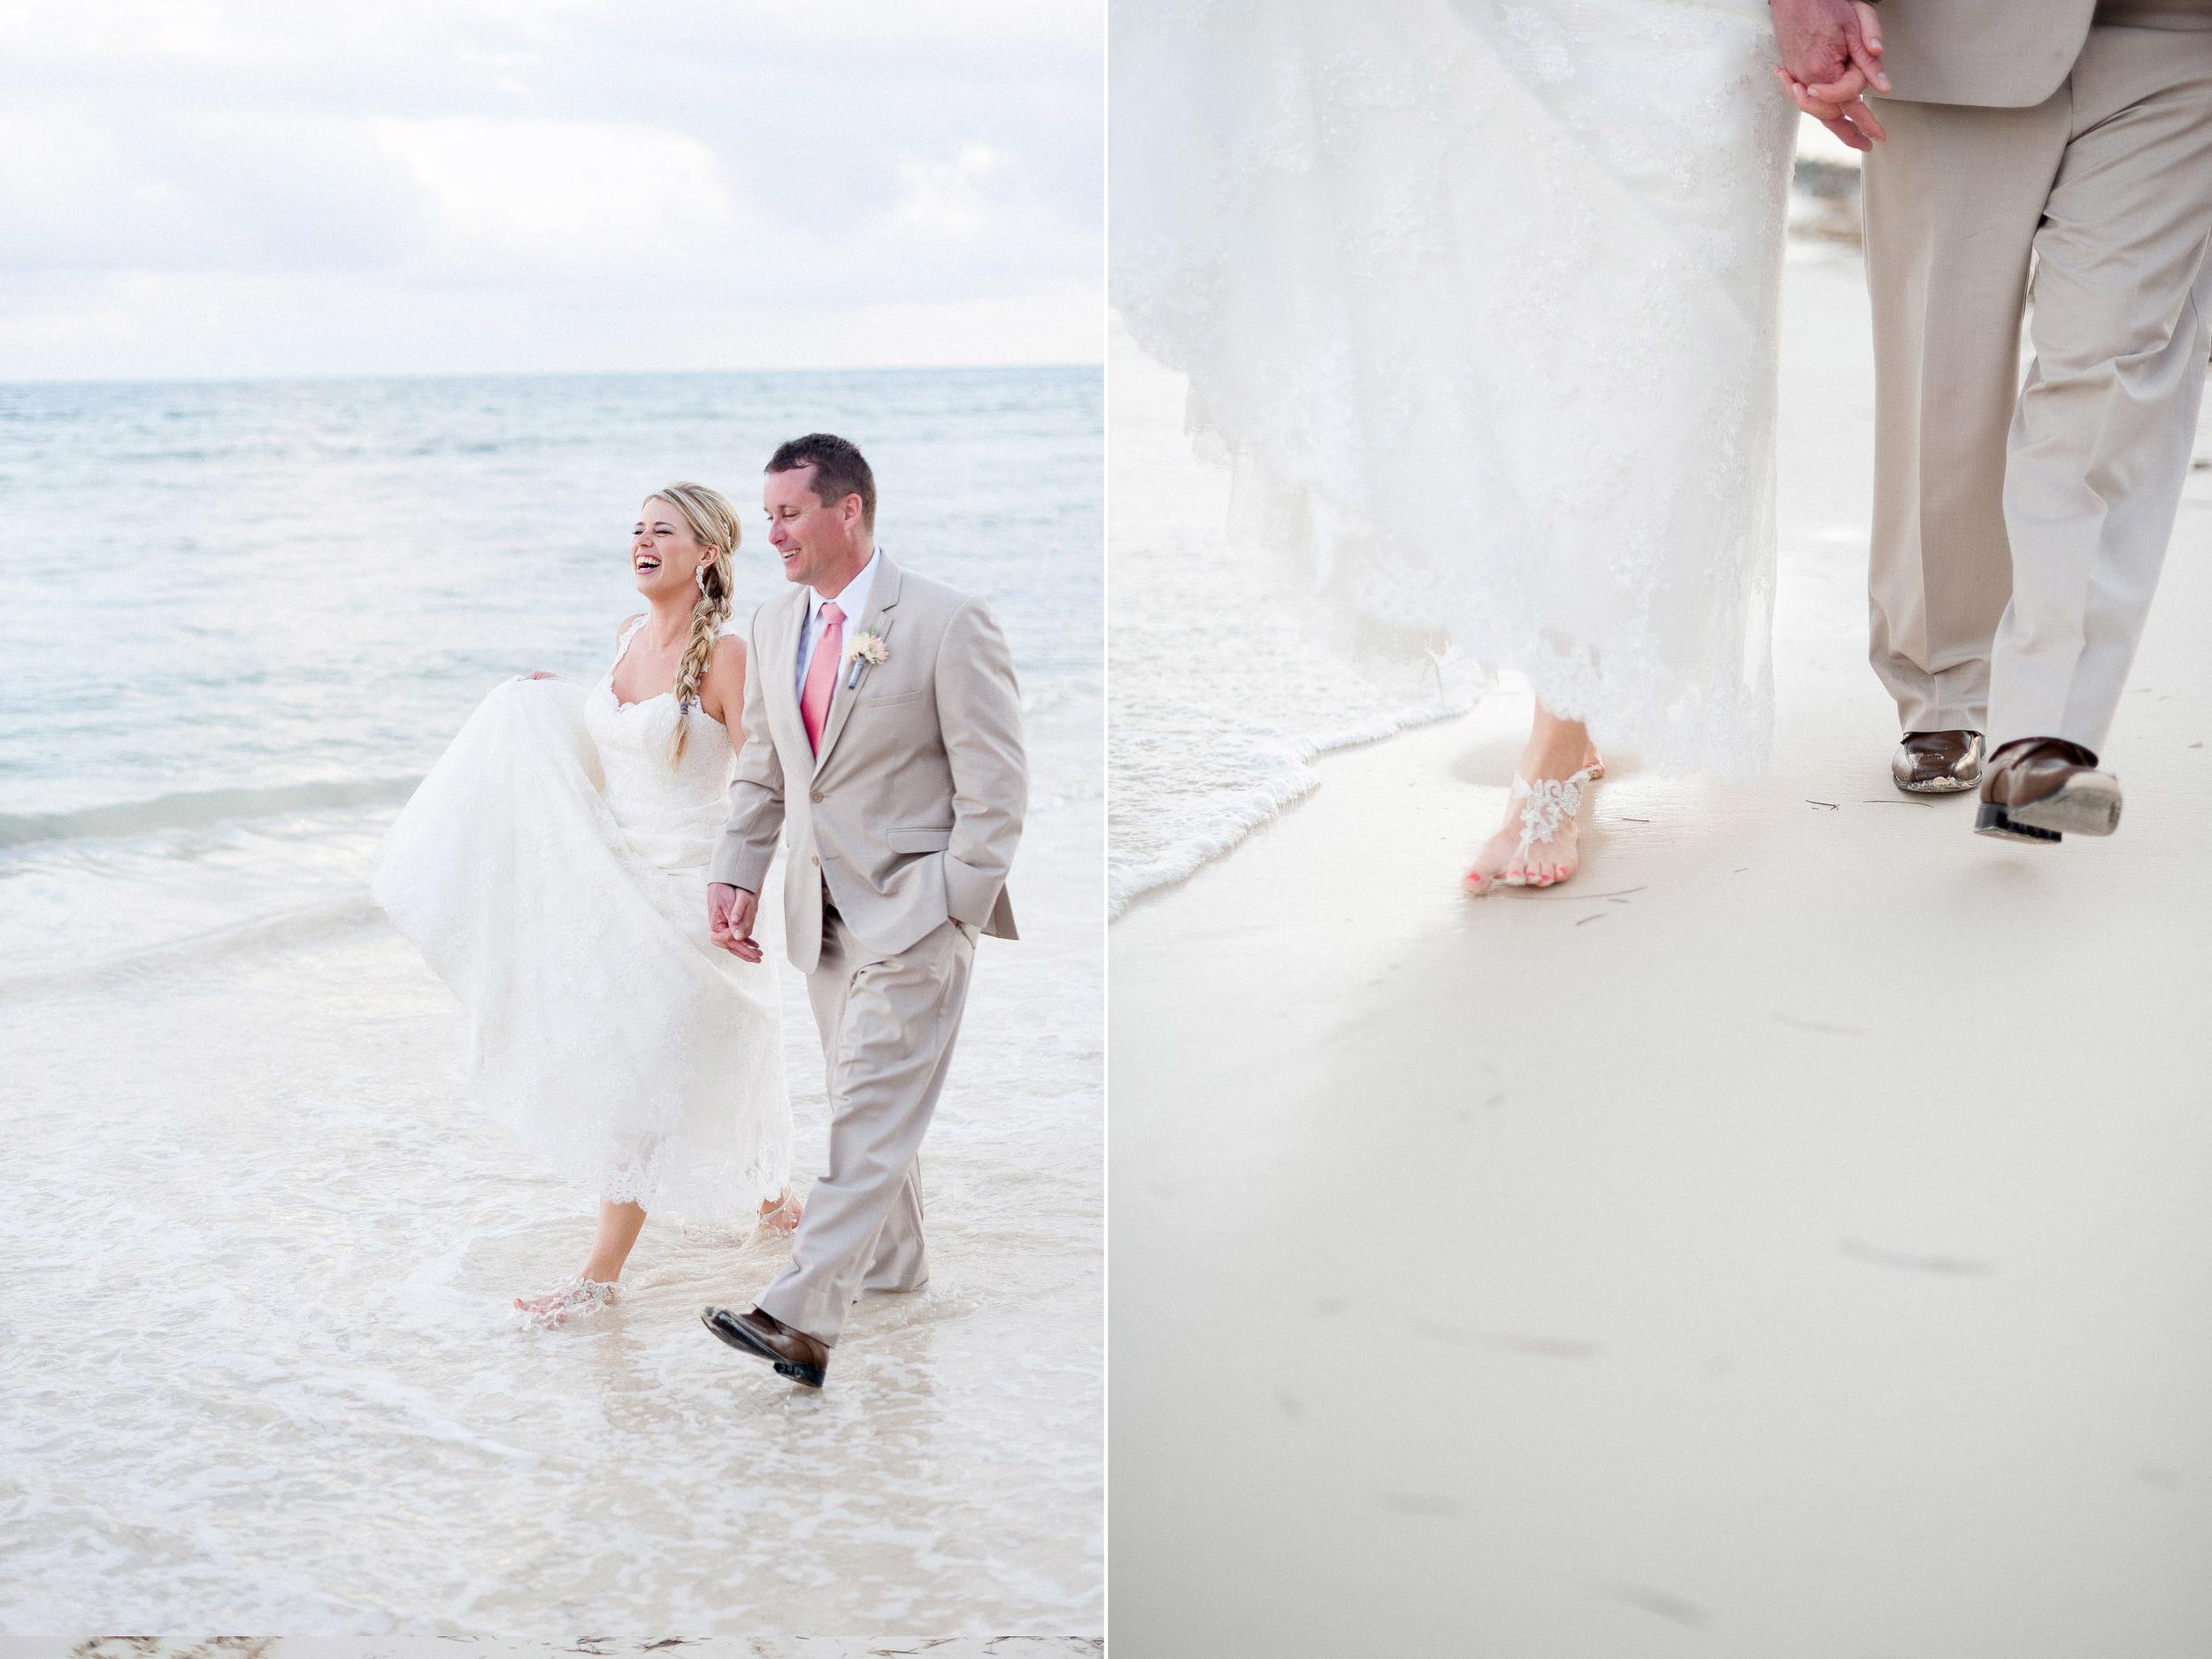 Megan and Chris wedding-49-1.jpg